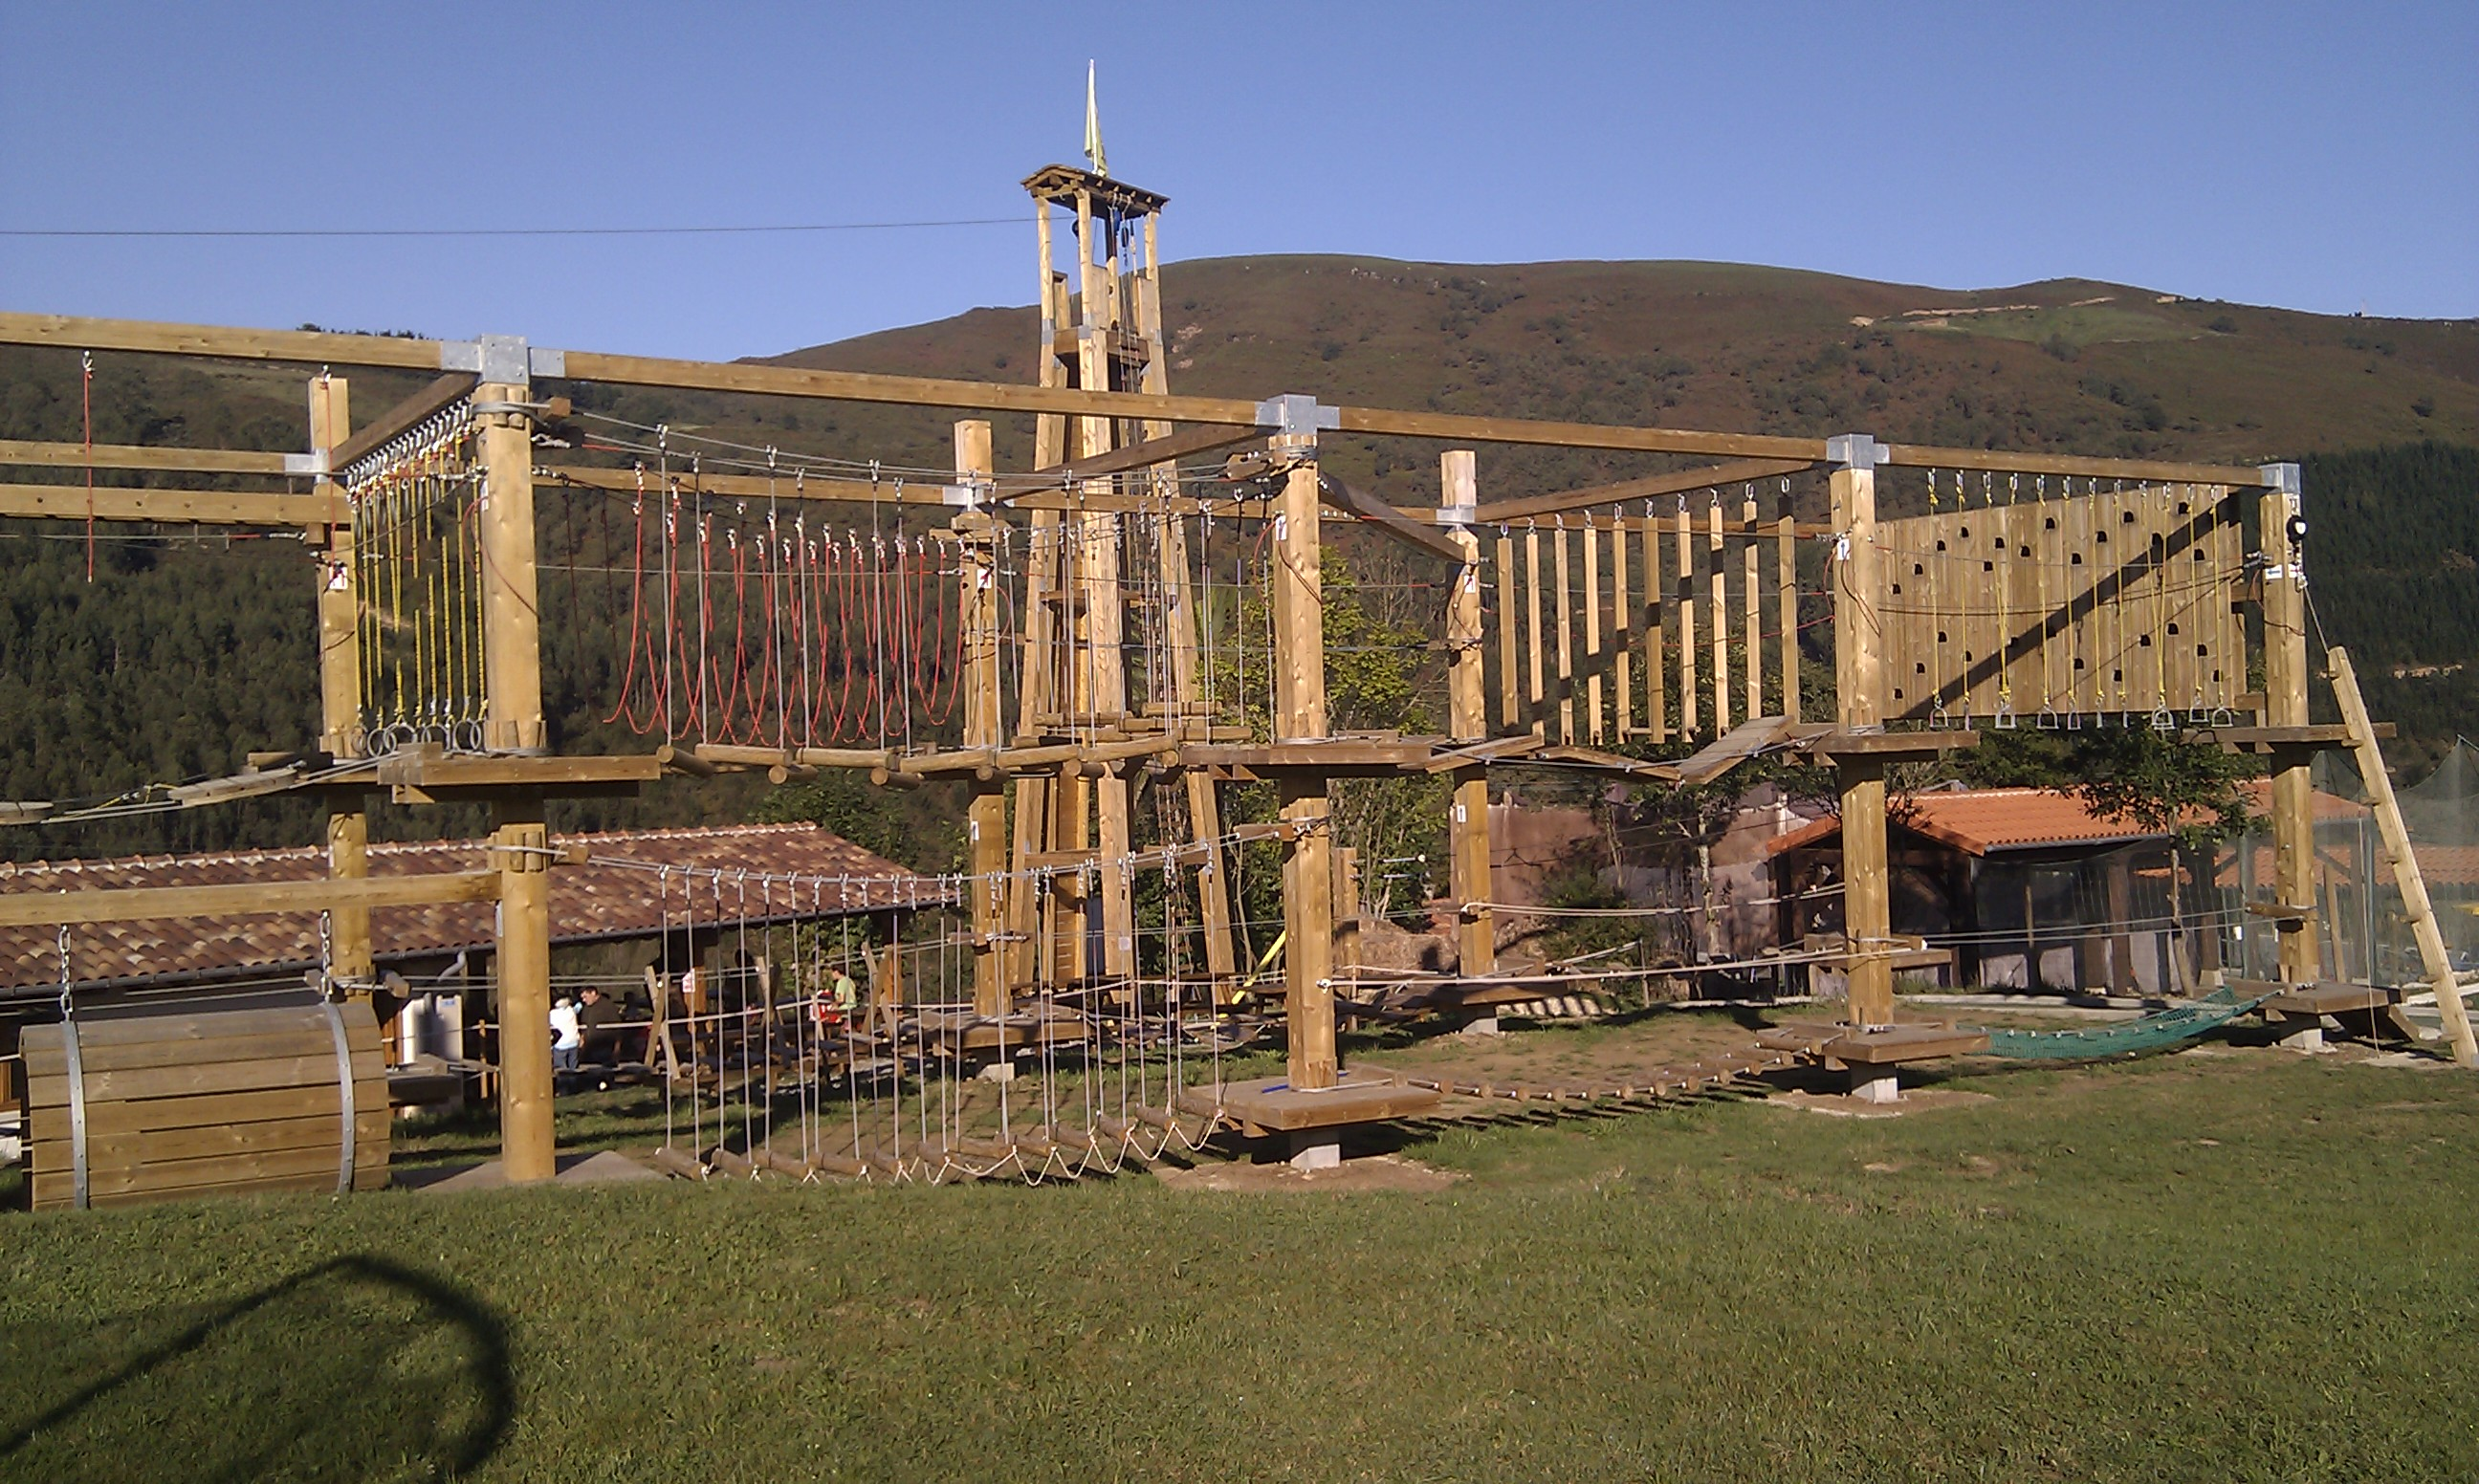 juegos_altura_tirolinas_2_Cantabria_Parque_multiaventura_ocio_juegos_cabuerniaventura